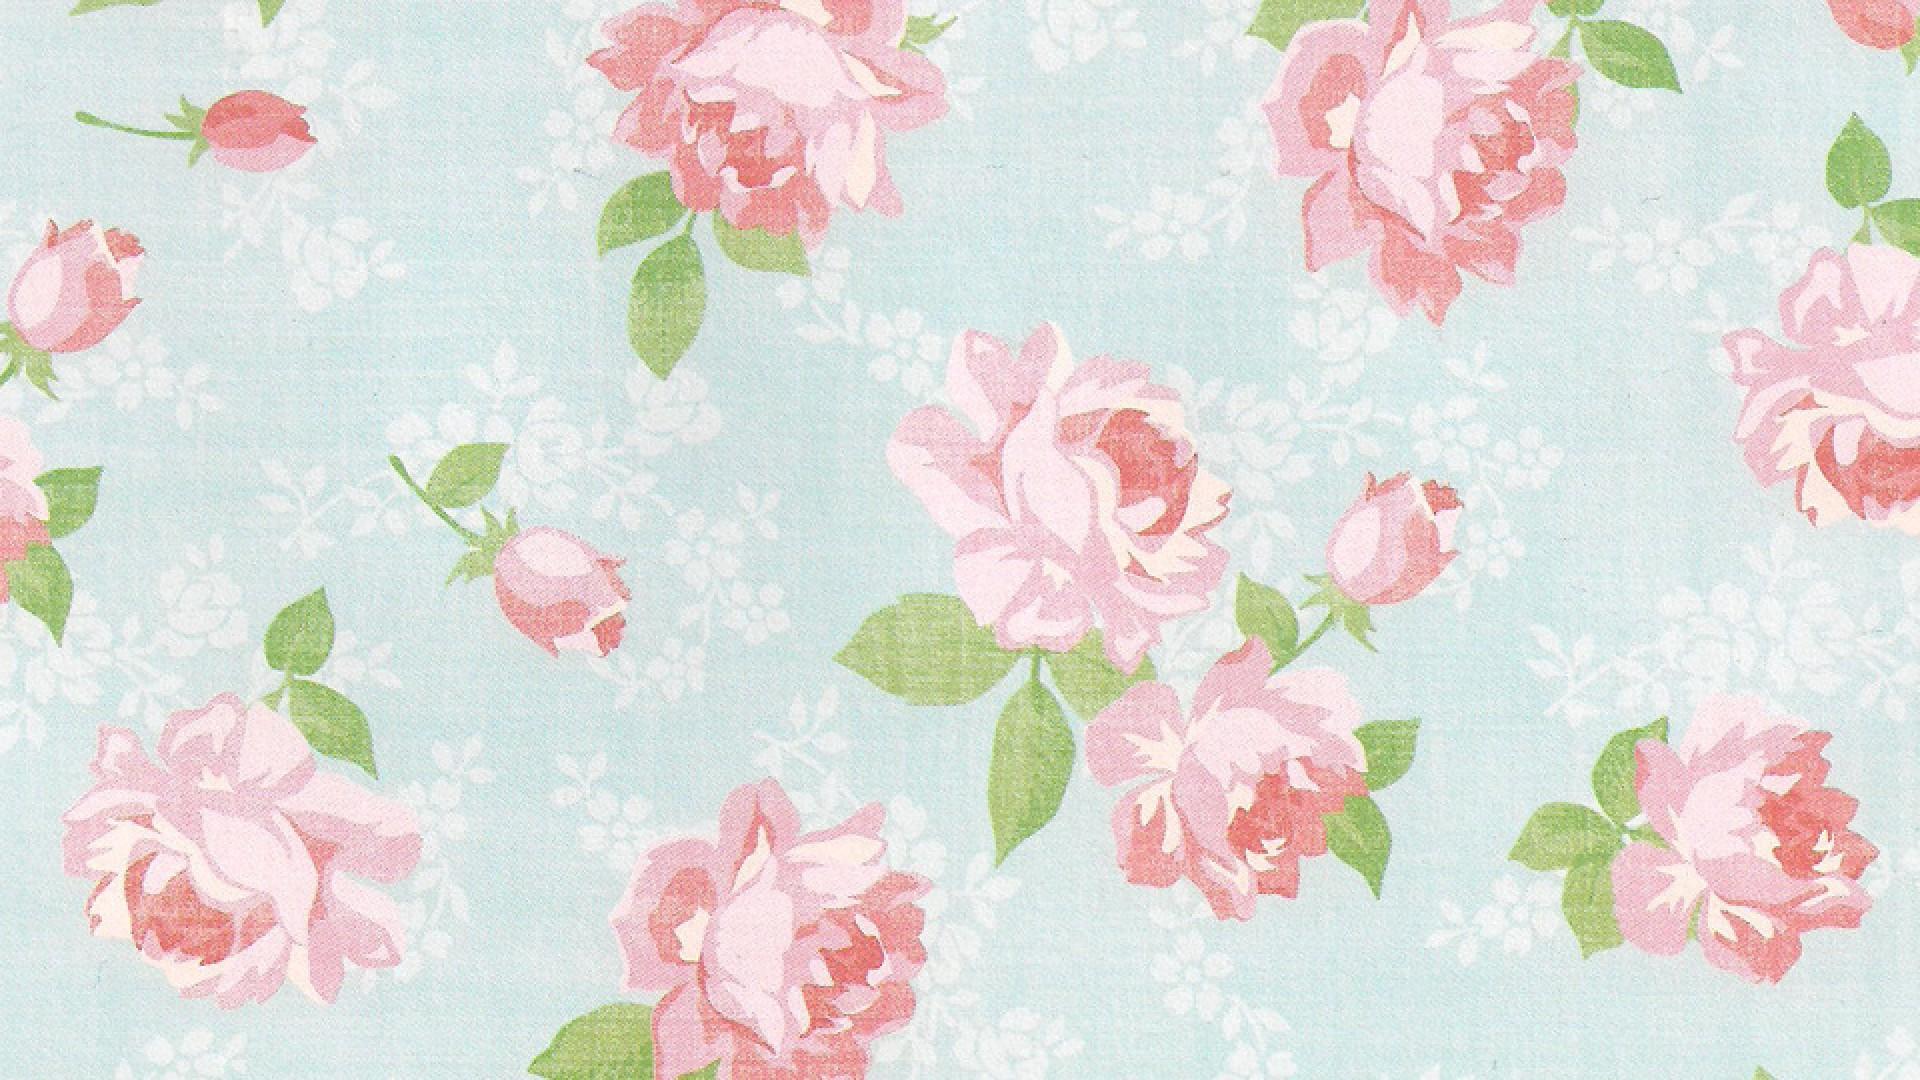 Vintage Flower Tumblr Wallpaper Hd Resolution Outdoors